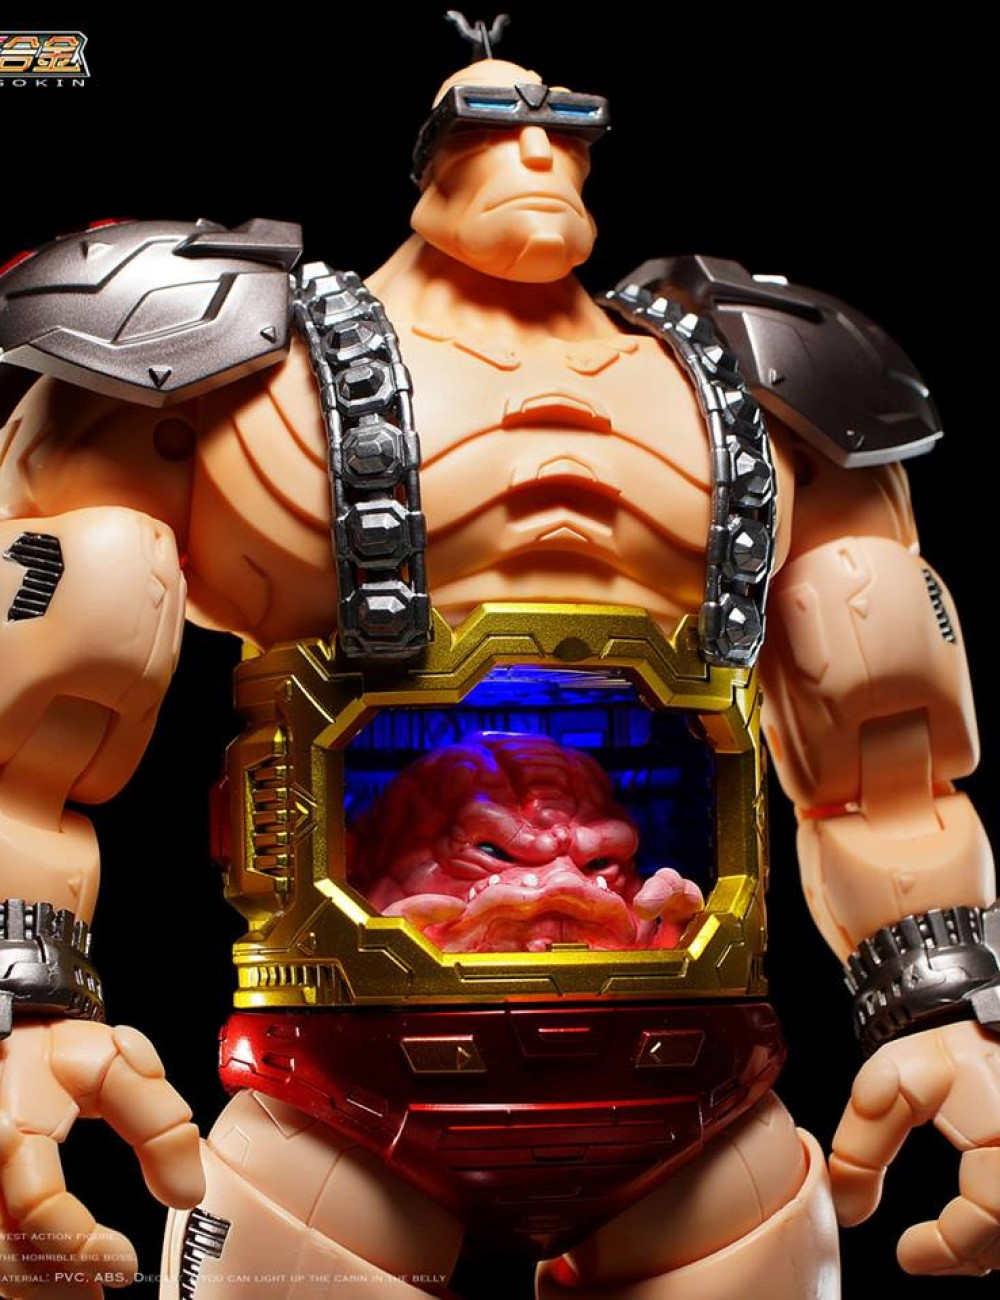 http://thetoychronicle.com/wp-content/uploads/2015/01/First-Gokin-Turtle-Enemy-Boss-TMNT-closeup--1000x1300.jpg